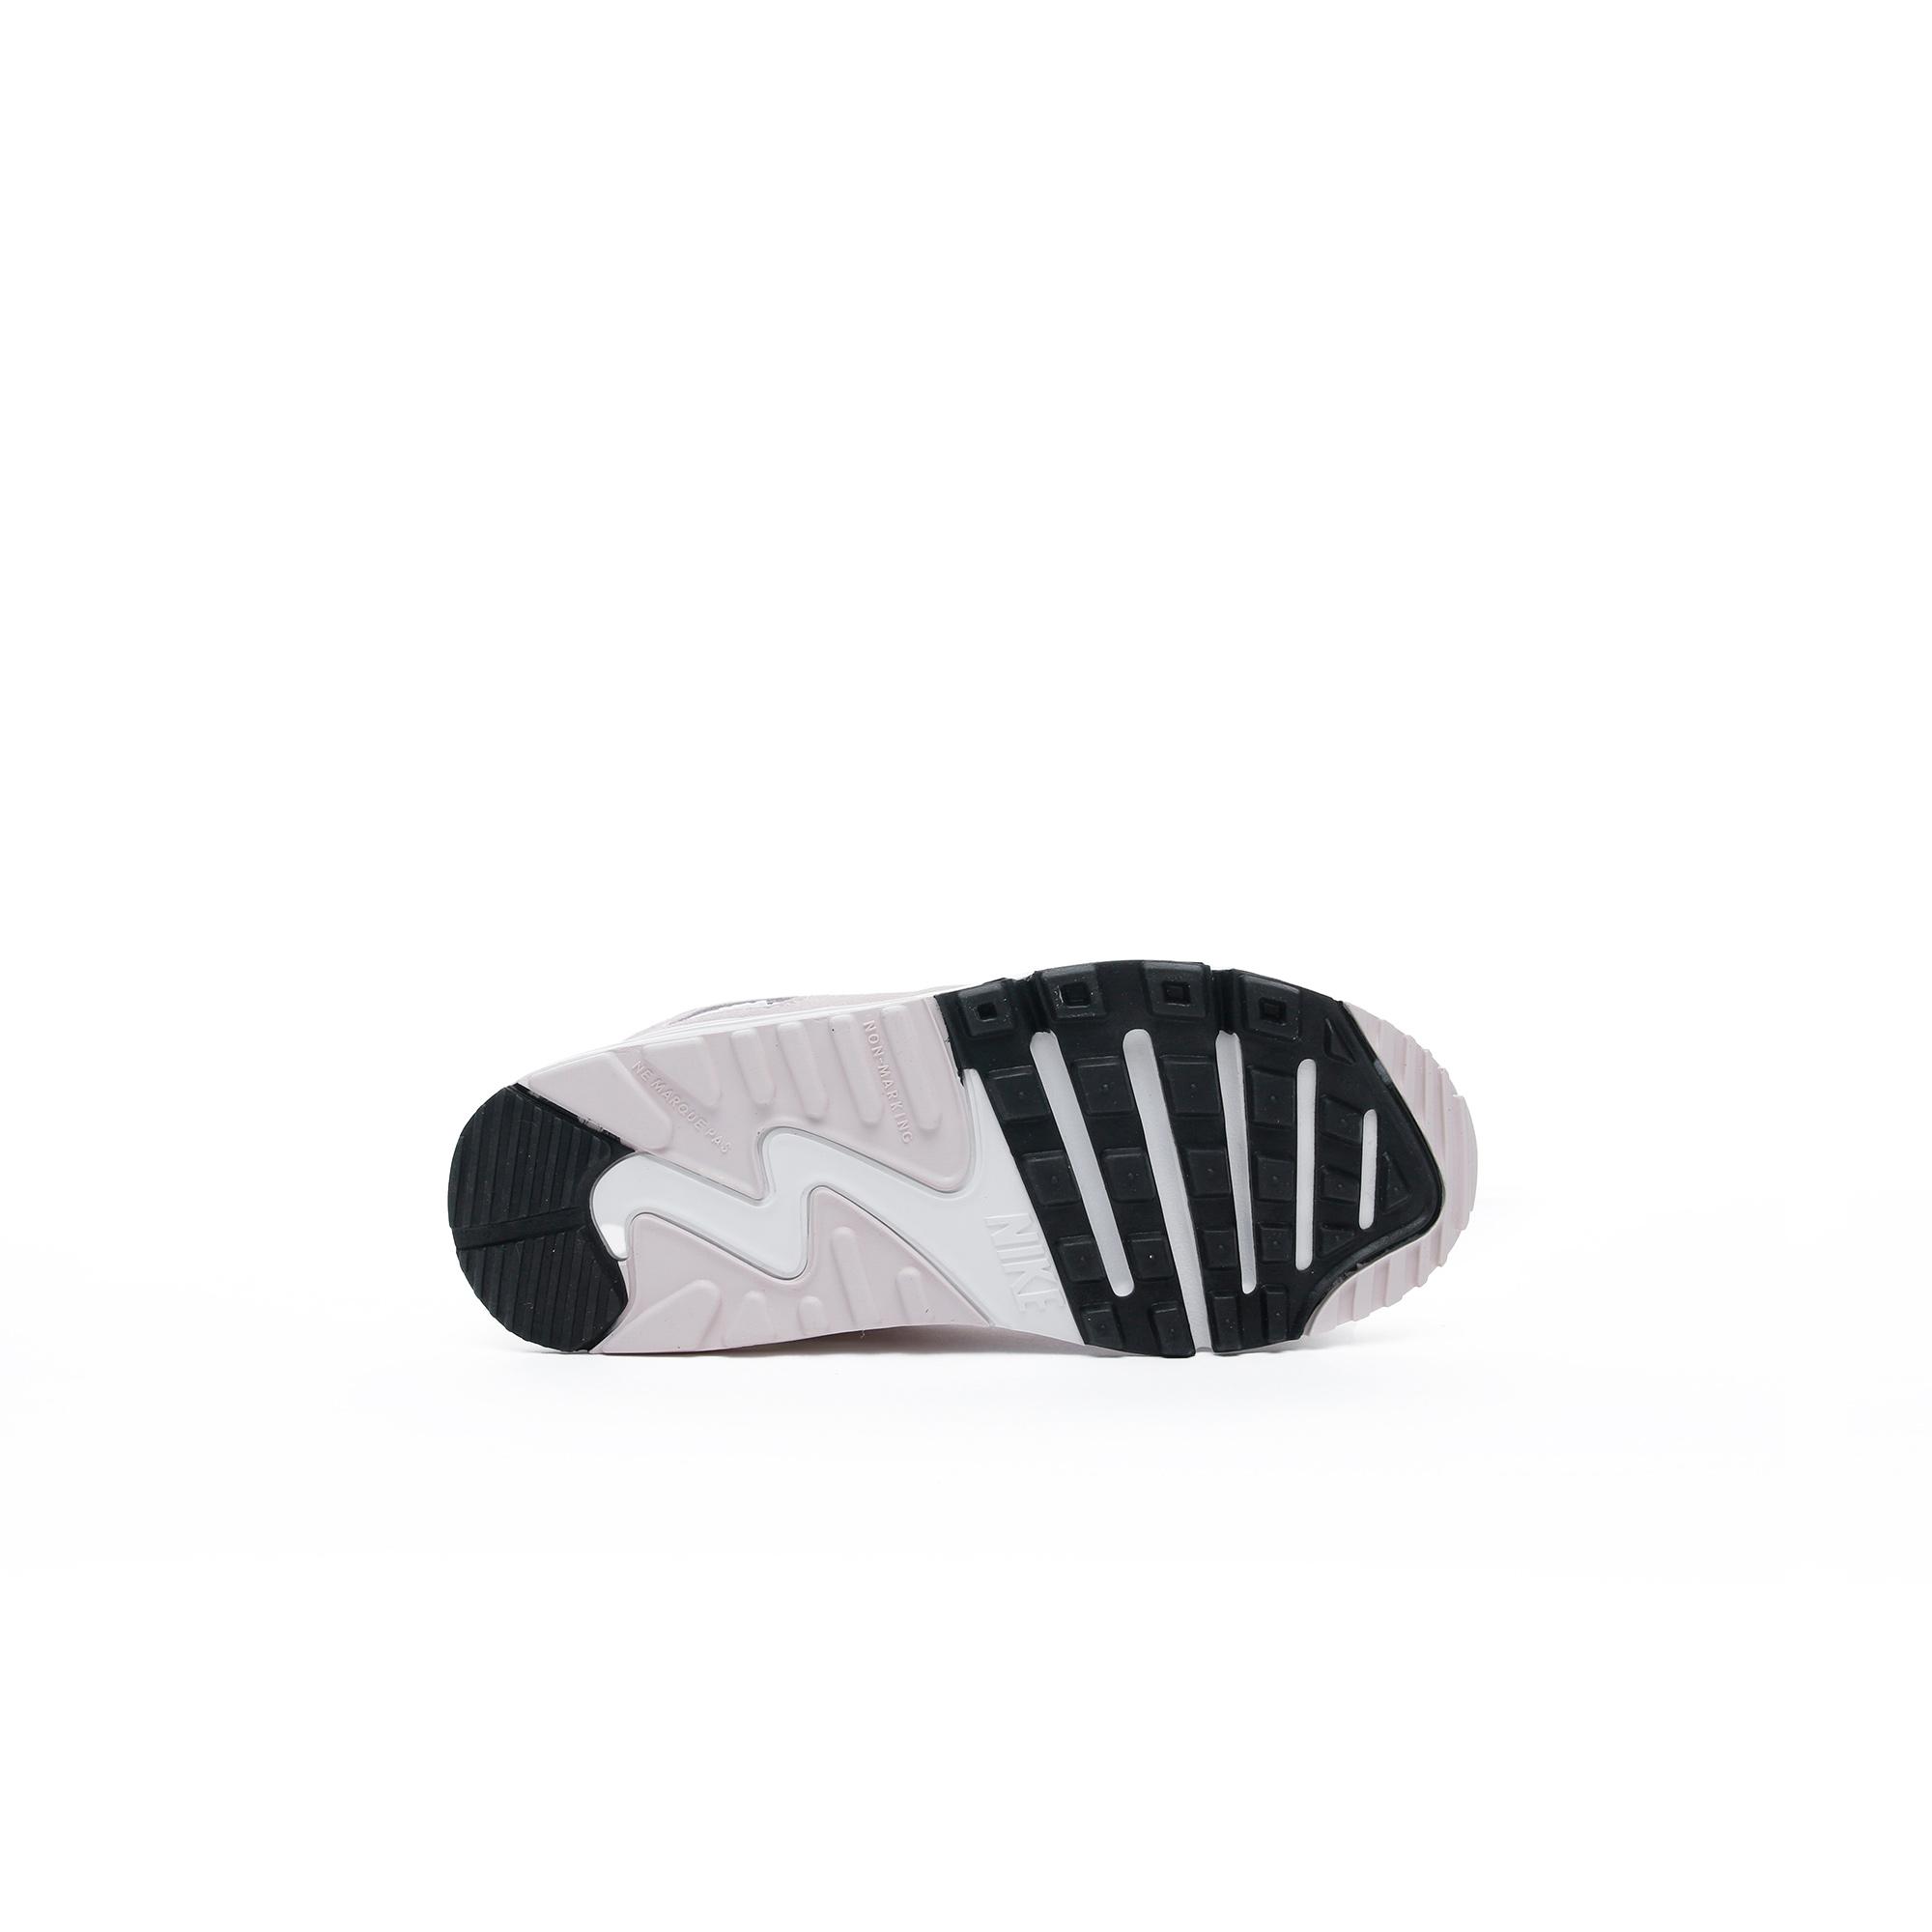 Nike Air Max 90 LTR Çocuk Pembe Spor Ayakkabı